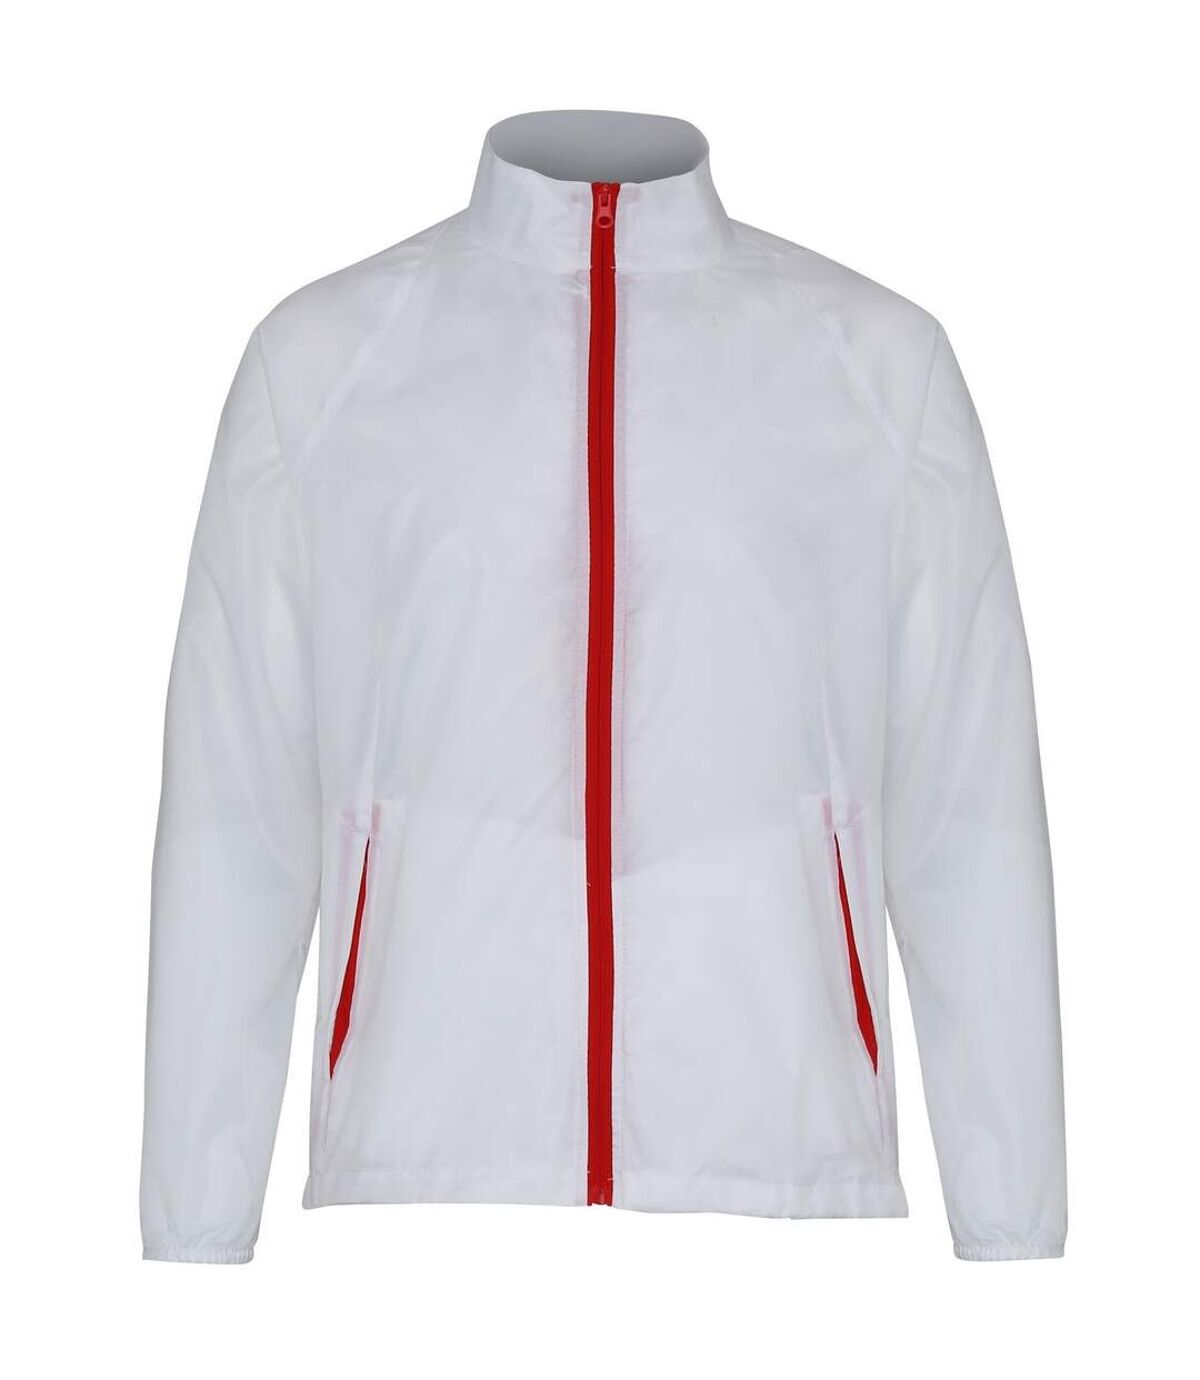 2786 Mens Contrast Lightweight Windcheater Shower Proof Jacket (Pack of 2) (White/ Red) - UTRW7001